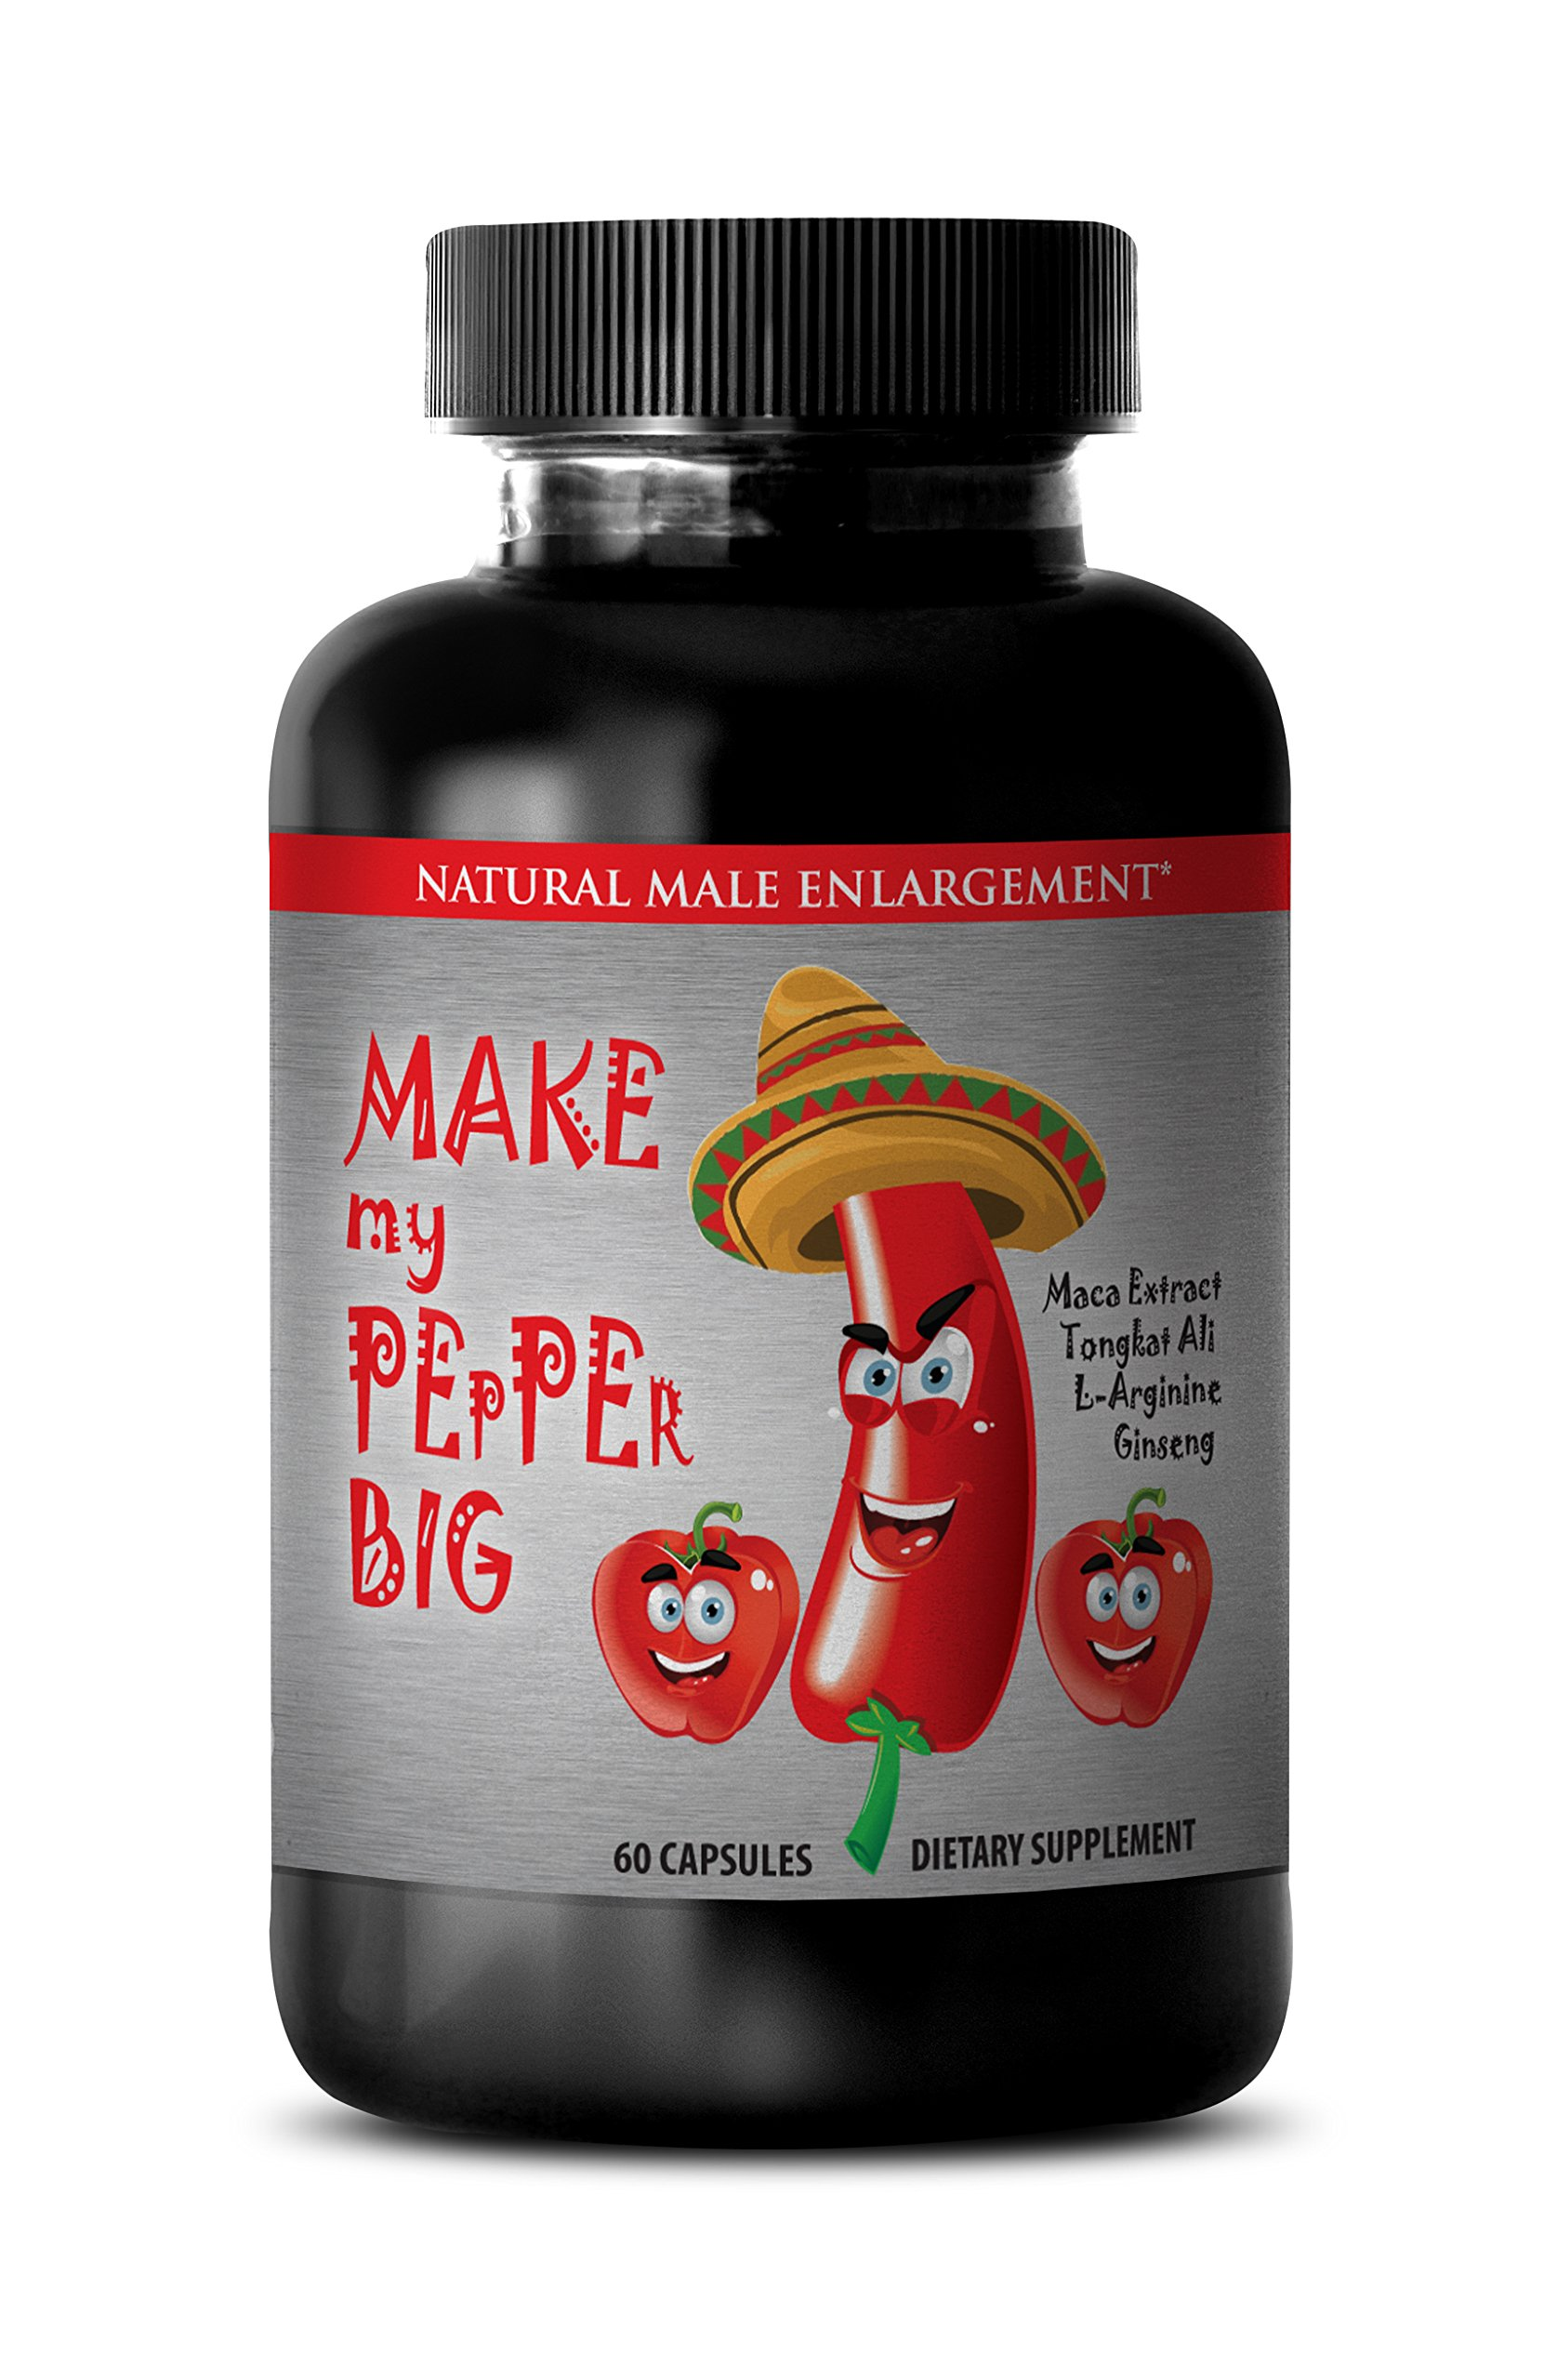 Tongkat Ali Male Enhancement Formula - ''Make My PEpPEr Big'' with Maca Root, L-Arginine, Ginseng (1 Bottle 60 Capsules)